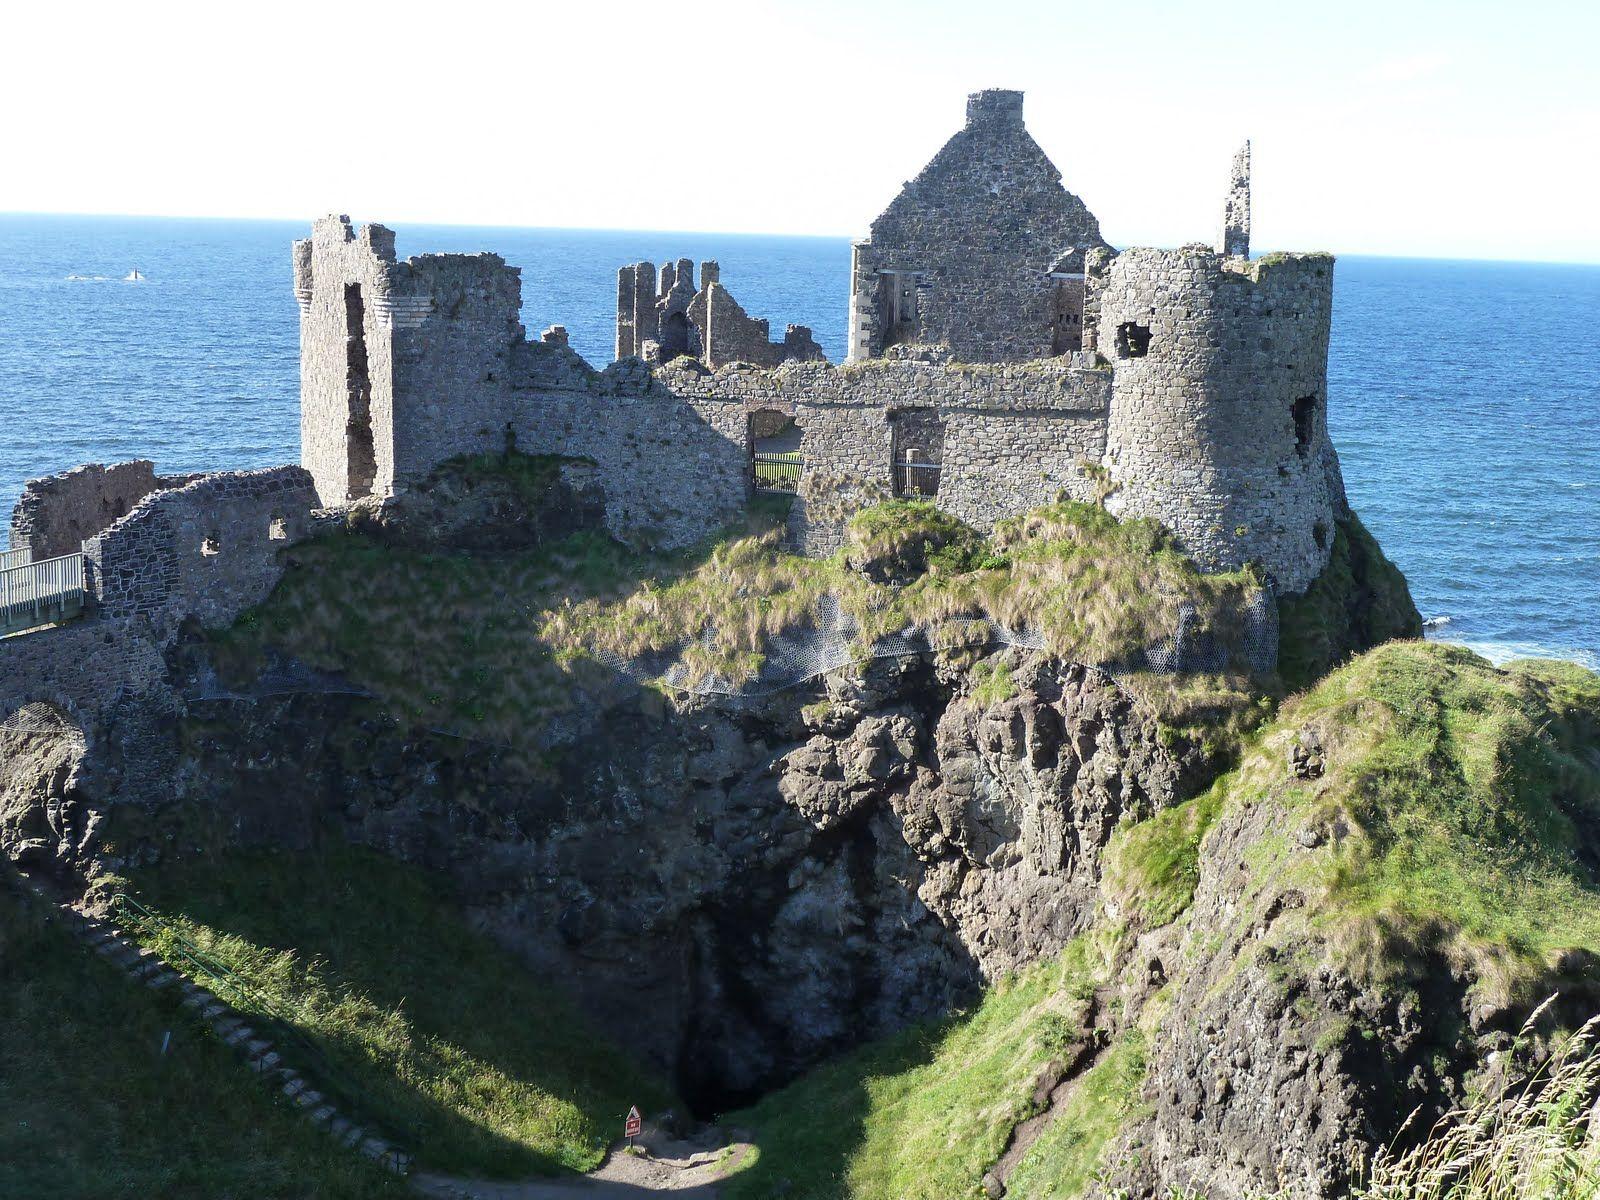 Travels with Shep: Northern Ireland: The Antrim Coast